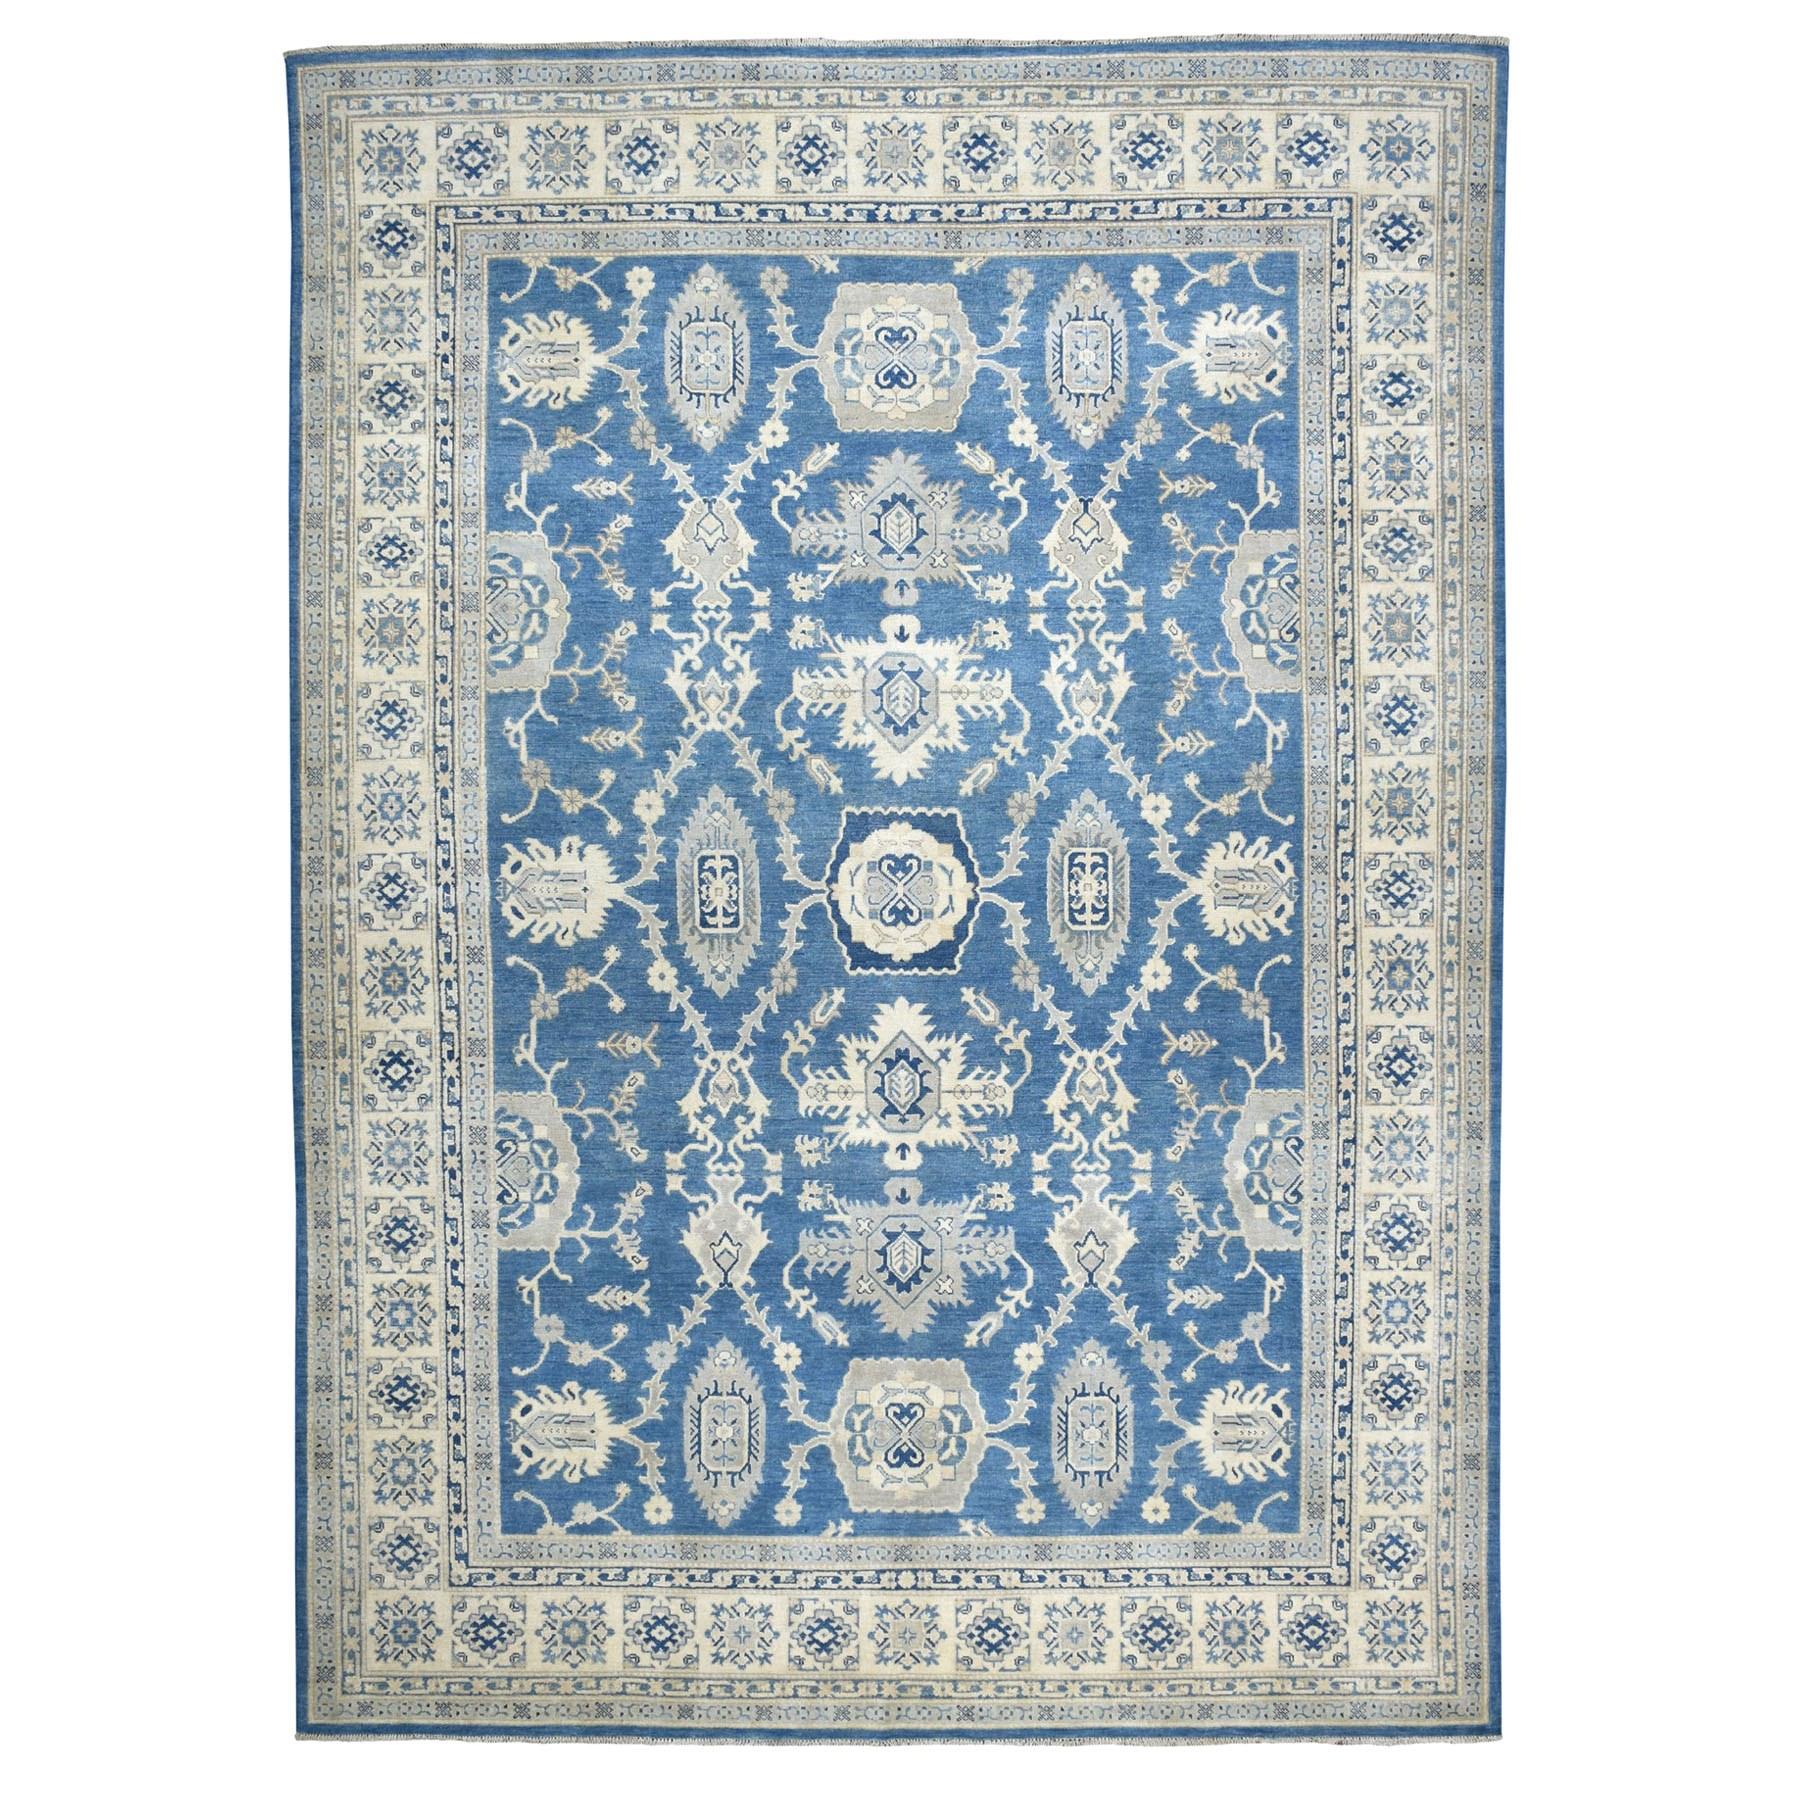 "8'8""x12' Blue Vintage Look Kazak Geometric Design Pure Wool Hand Knotted Oriental Rug"